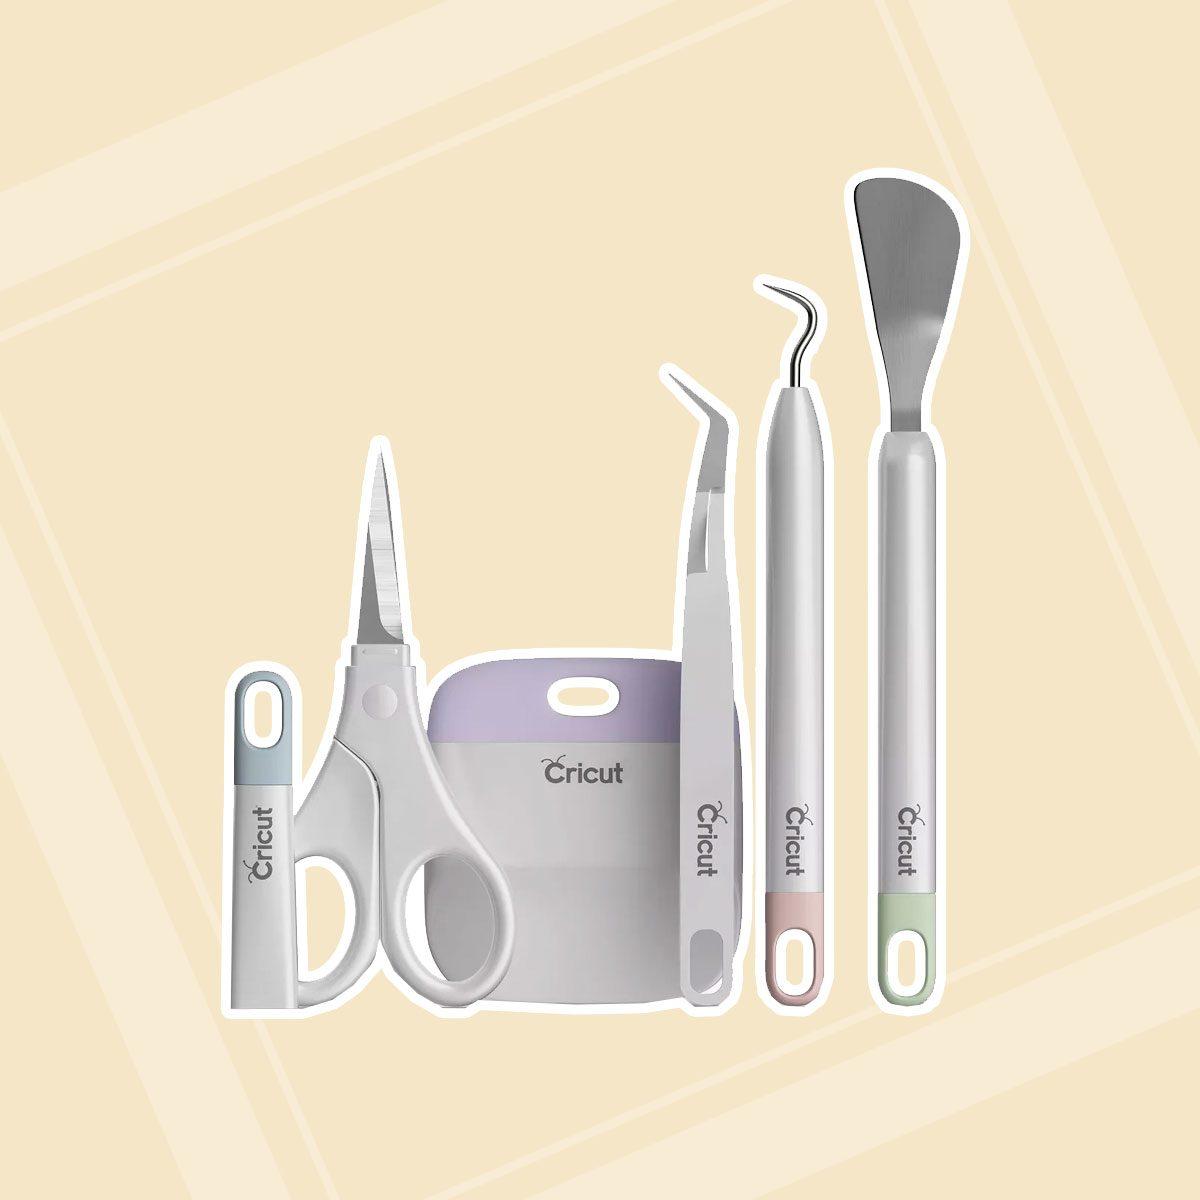 Cricut 5-Piece Tool Set